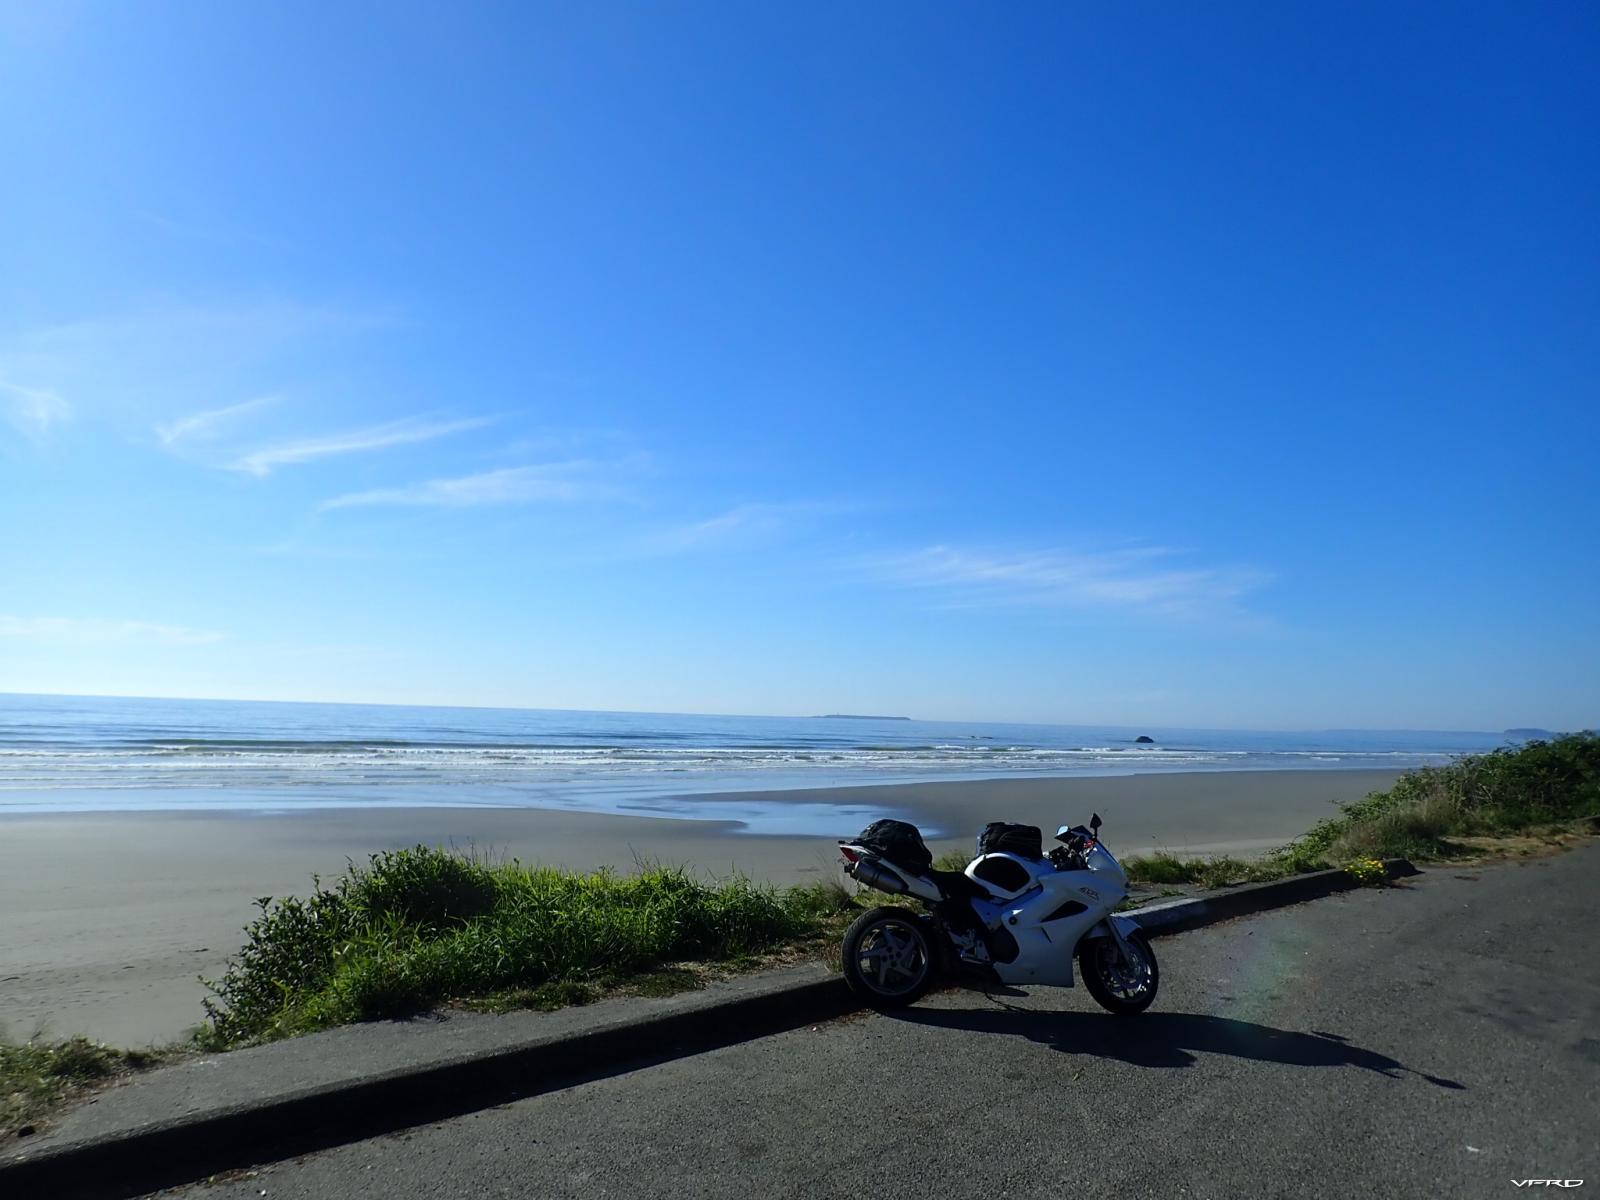 Washington's forgotten coastline